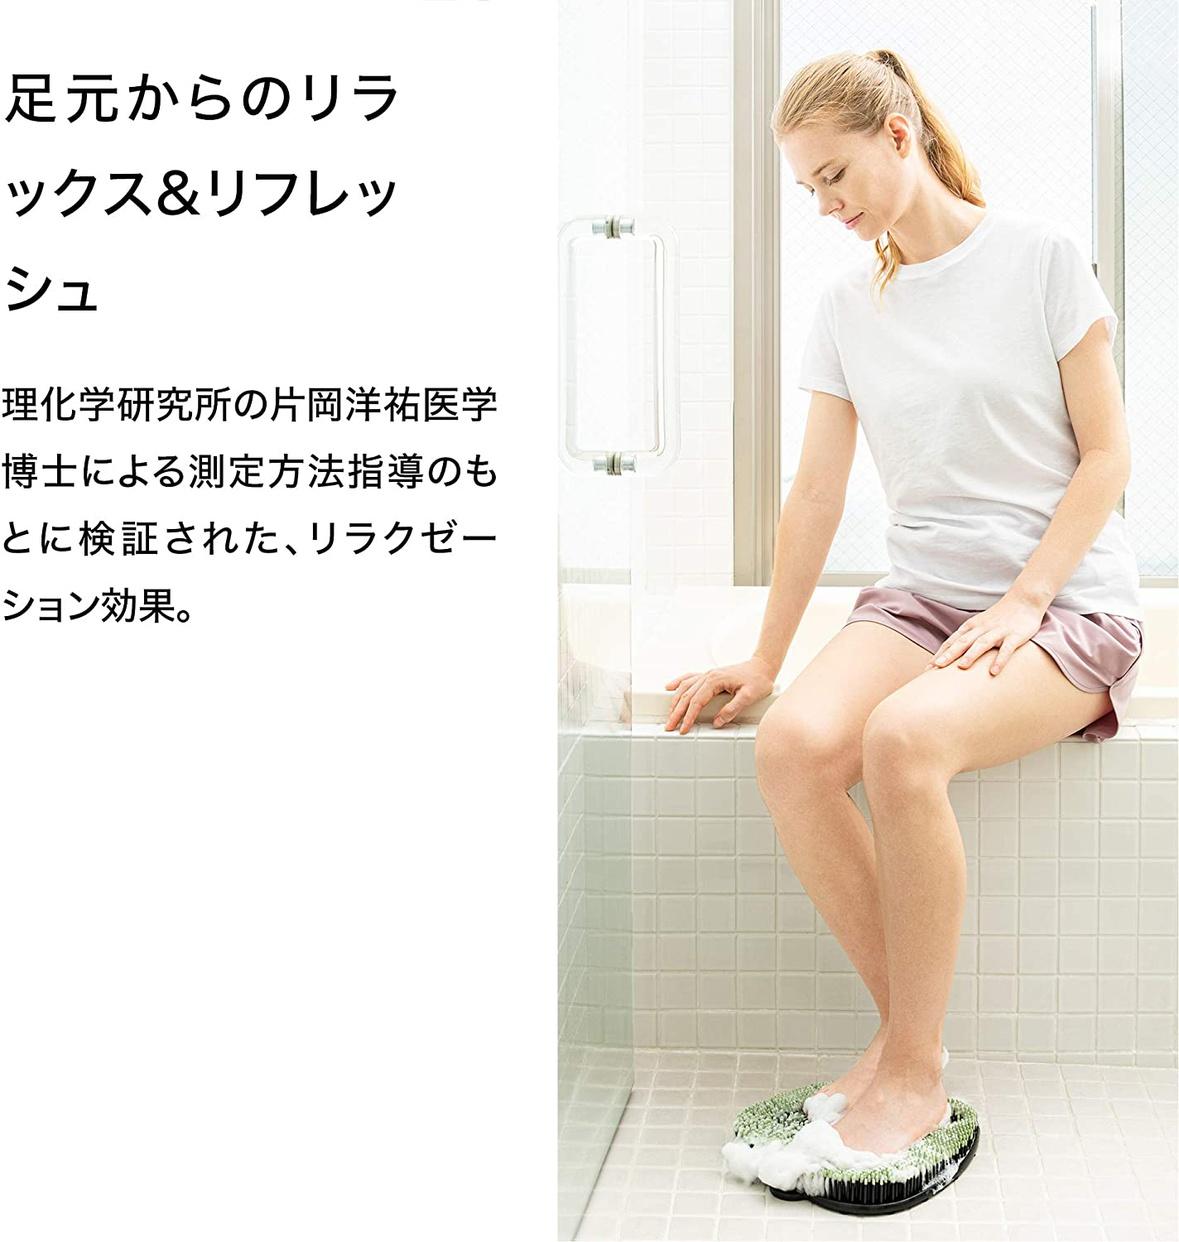 Sunpac(サンパック) フットグルーマーグランスポーツの商品画像7